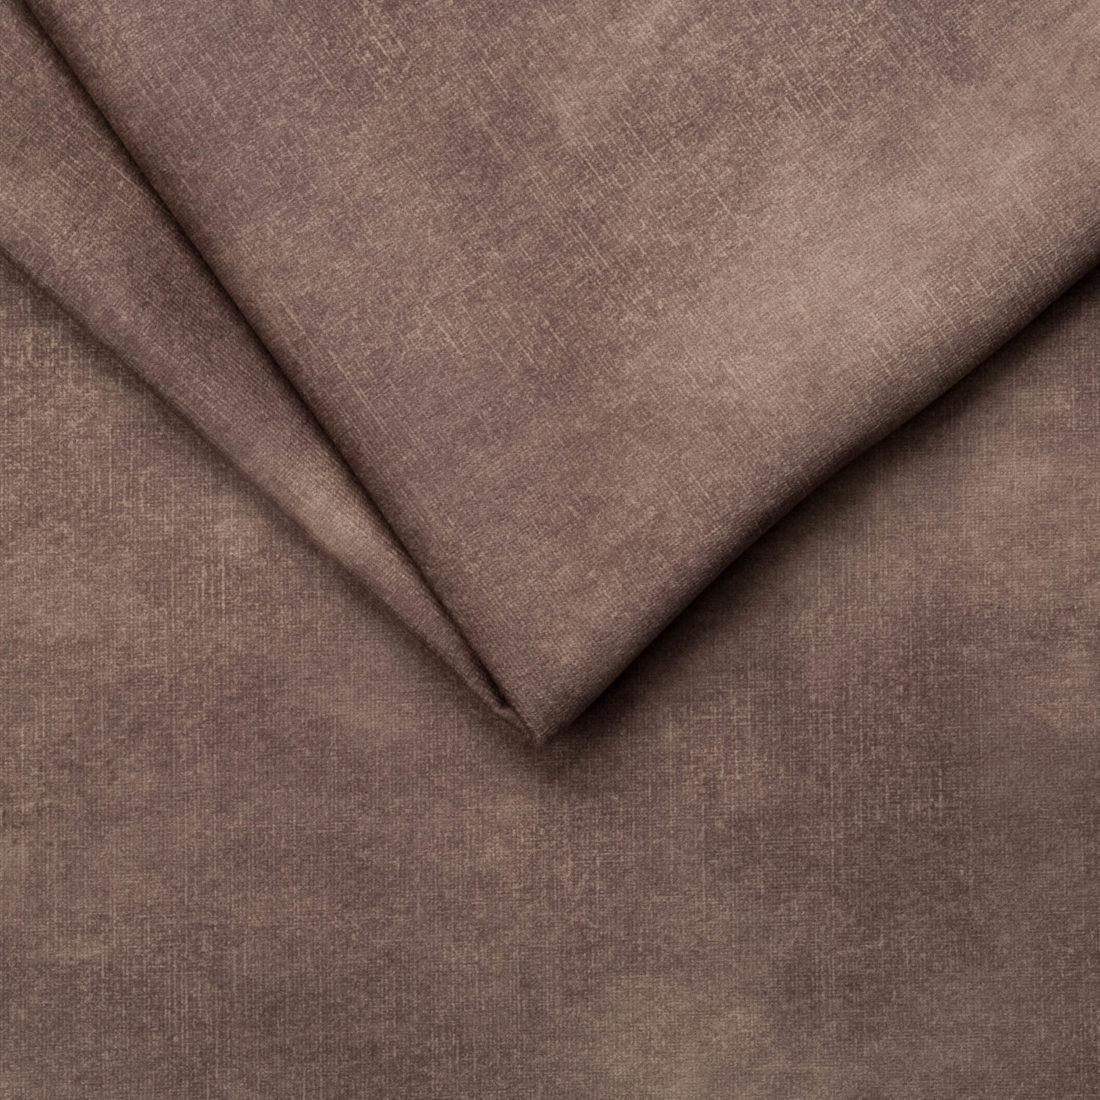 Мебельная ткань Palladium 5 Brown, велюр